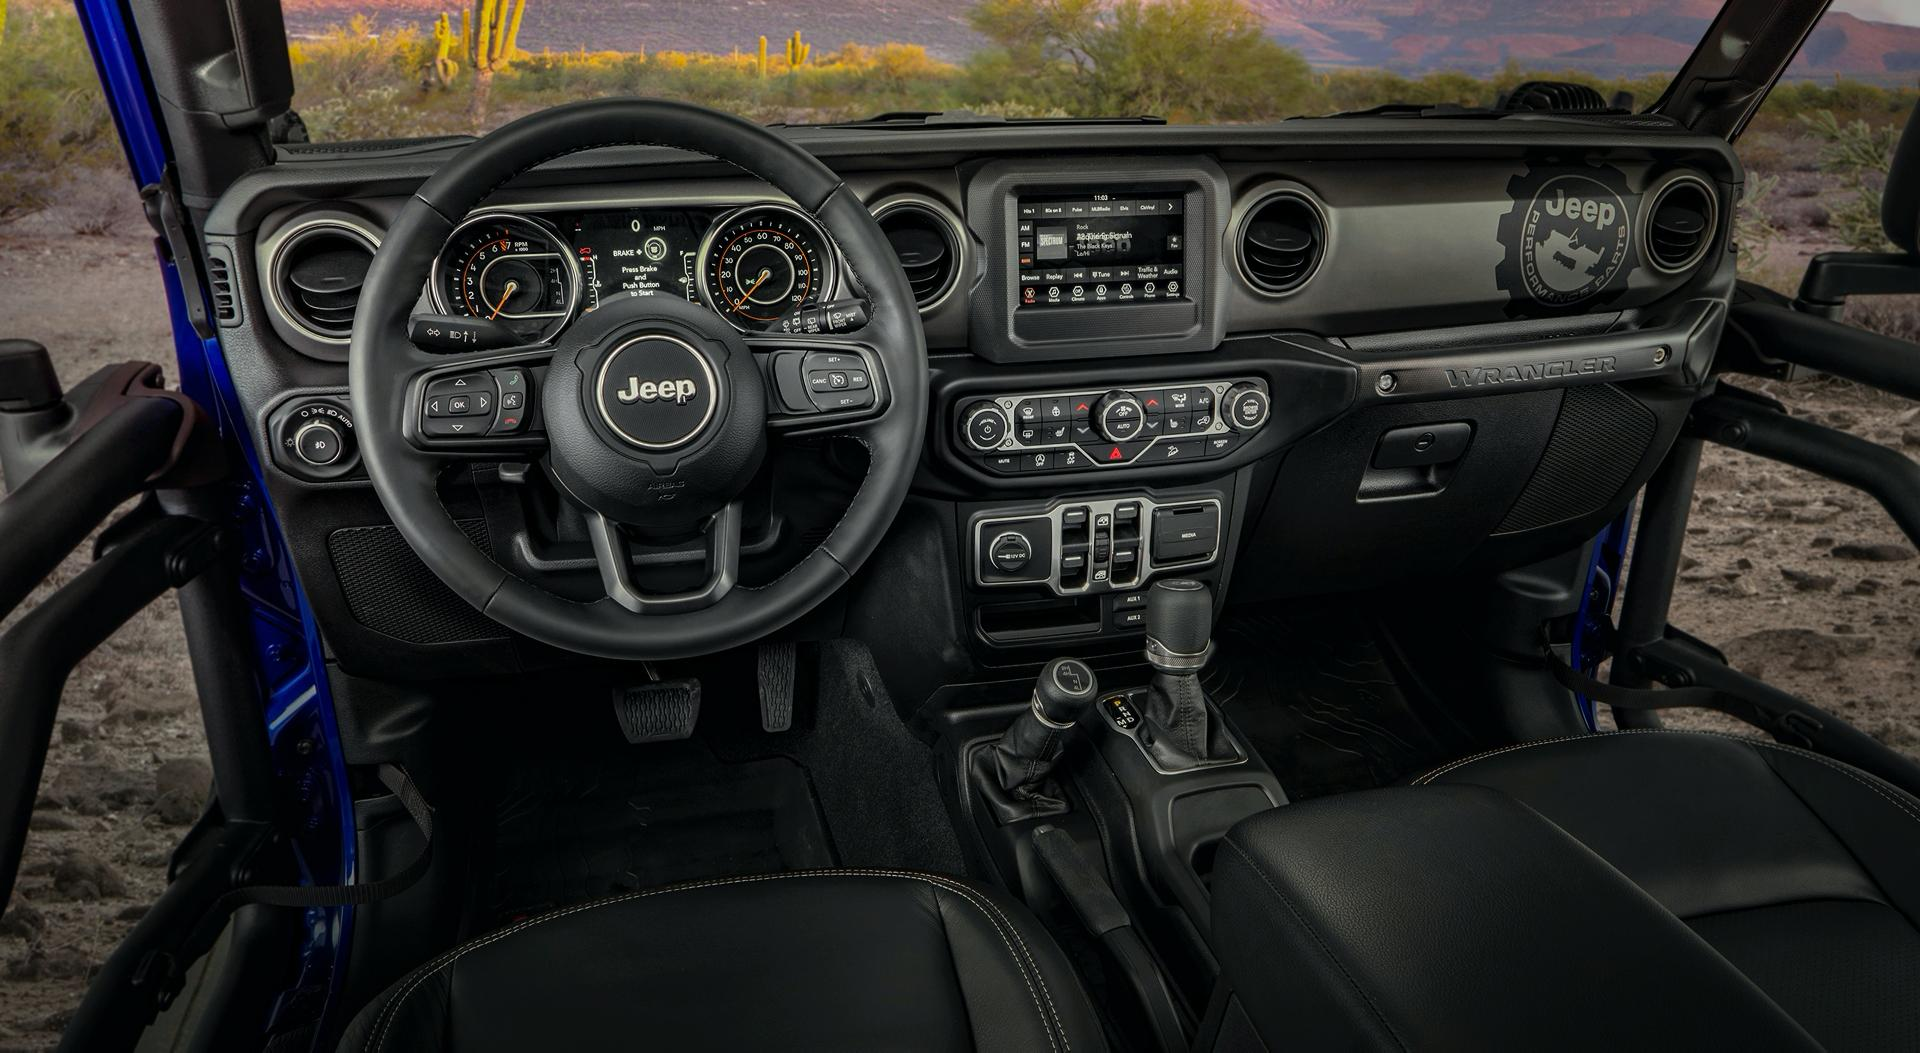 Jeep-Wrangler-JPP-20-Limited-Edition-11